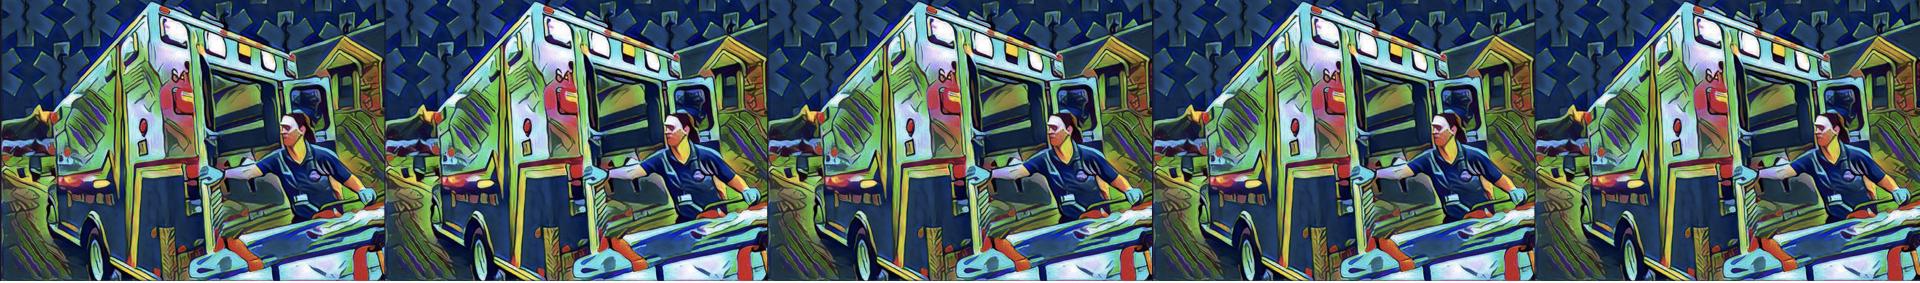 Evidence-Based EMS:  Evidence-Based Reviews of Prehospital Care